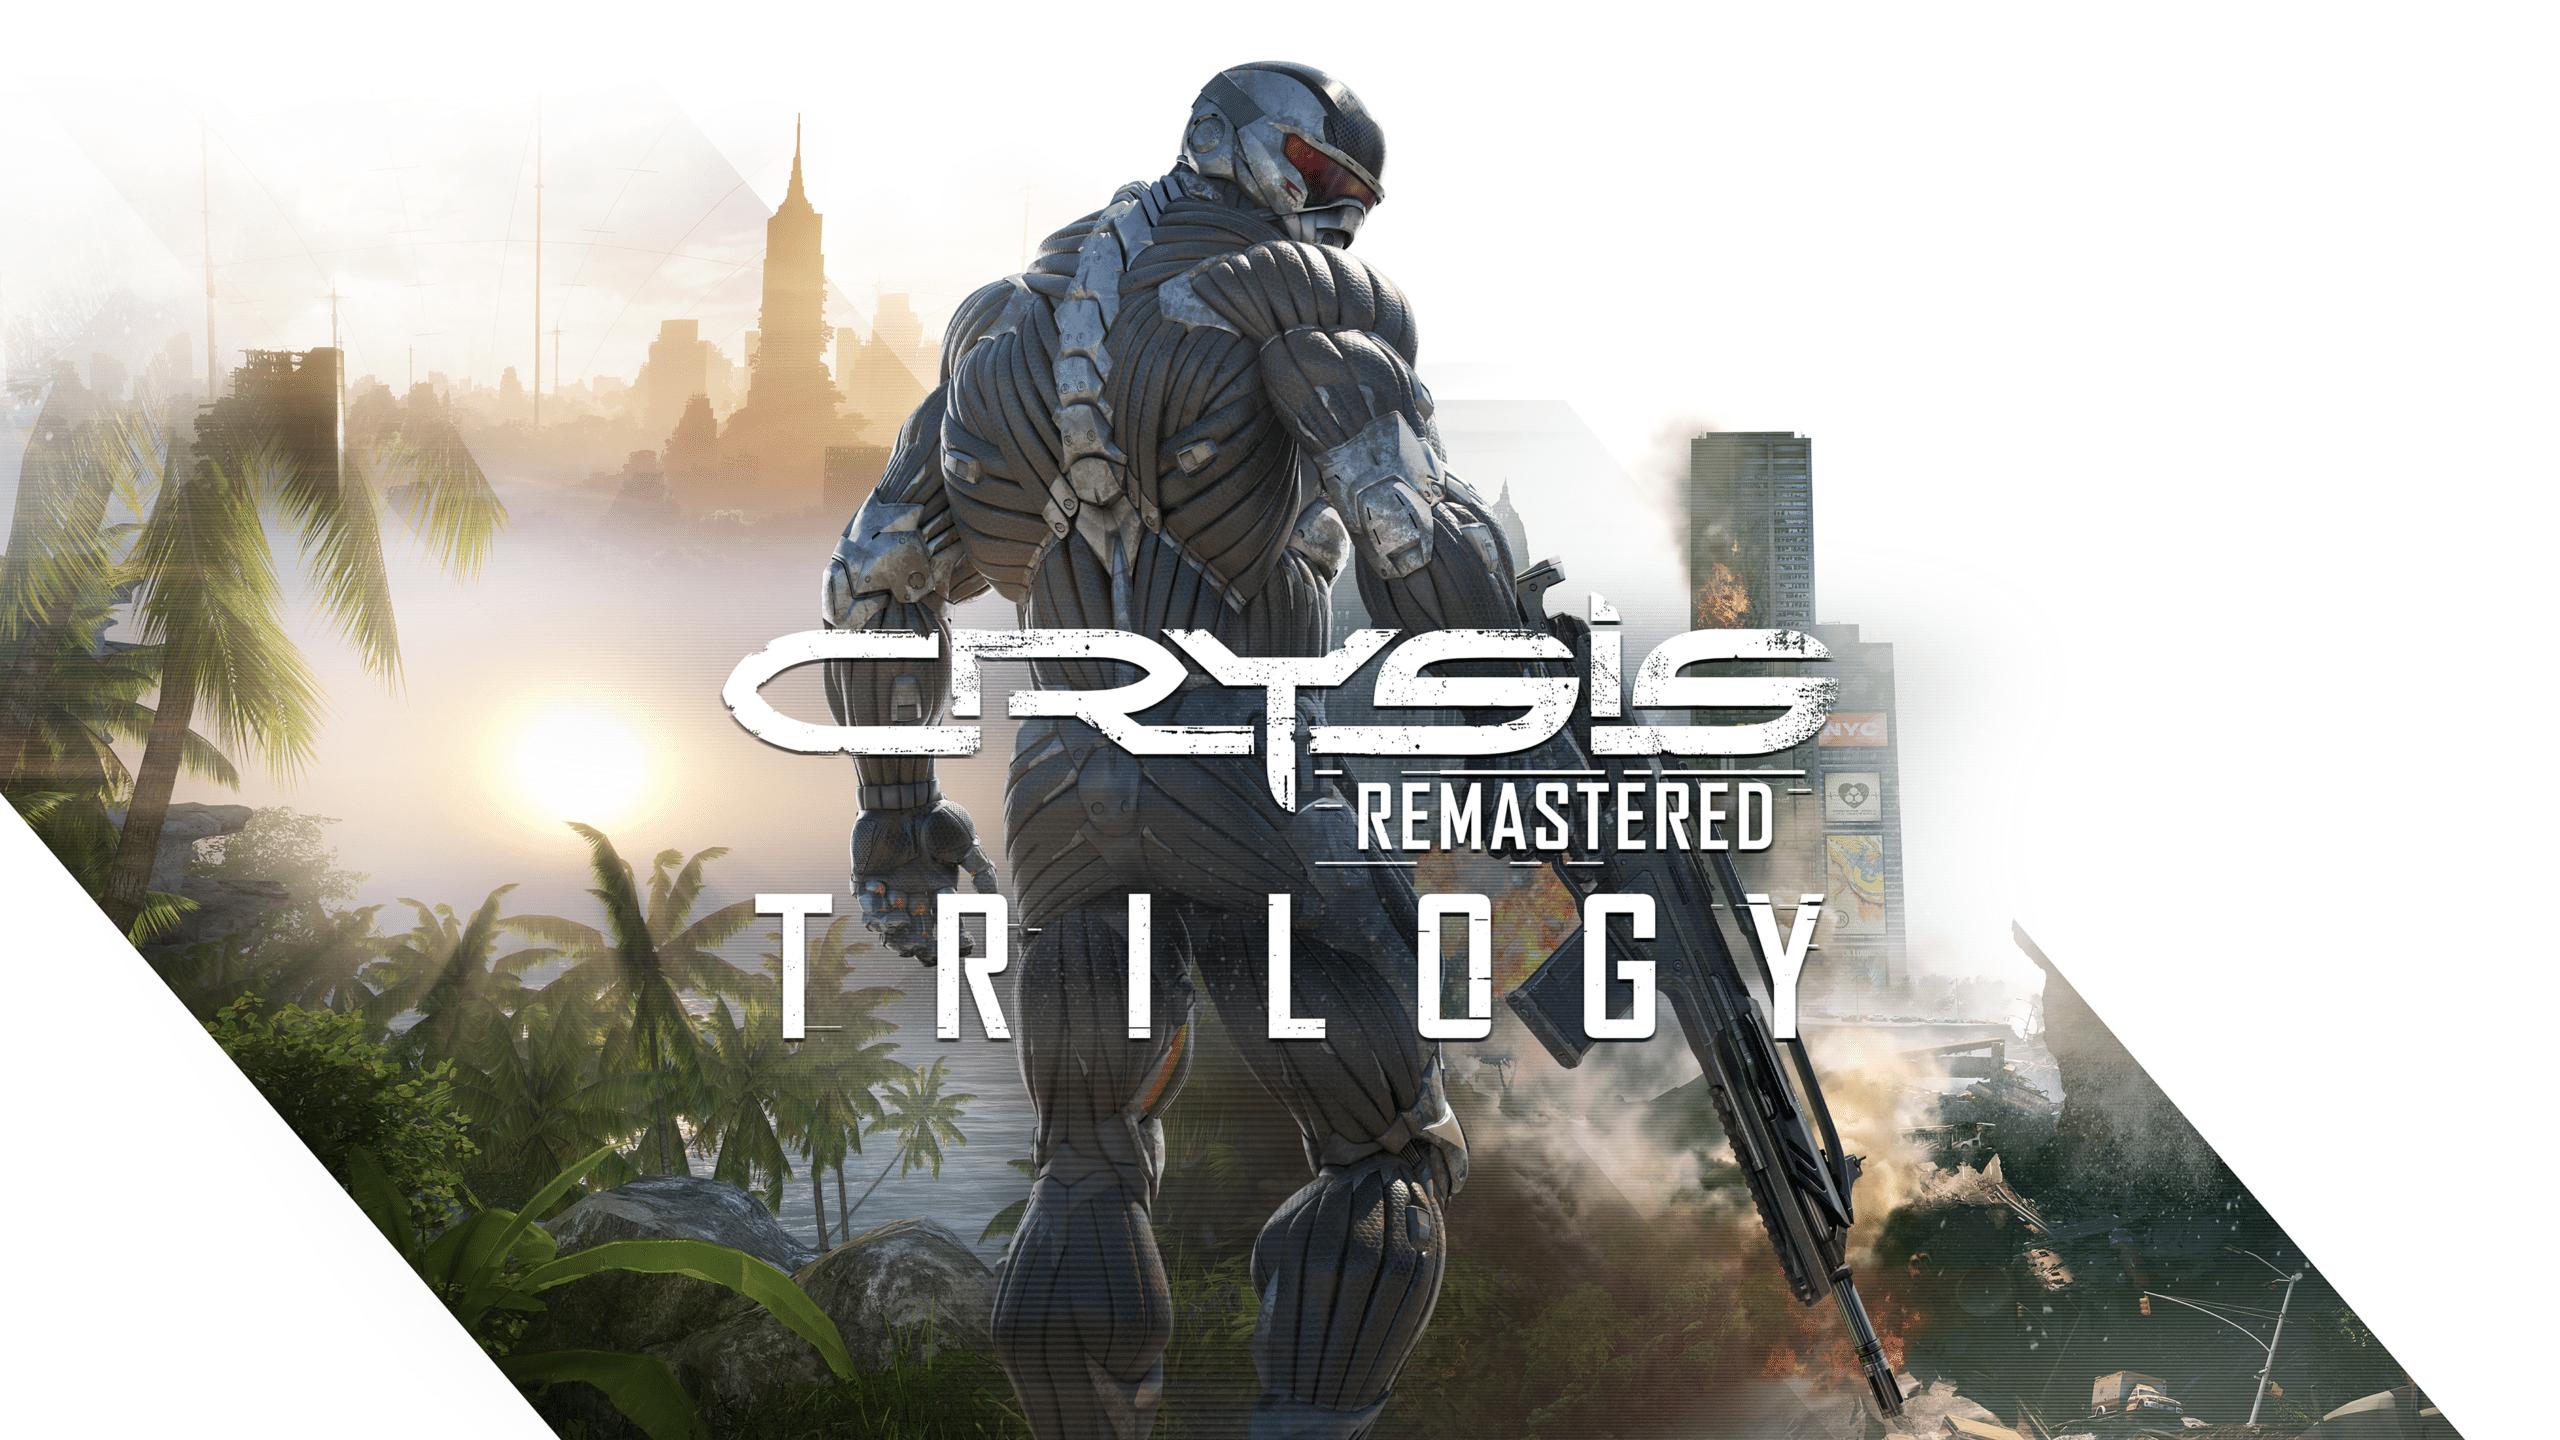 Esce oggi Crysis Remastered Trilogy per console e PC thumbnail